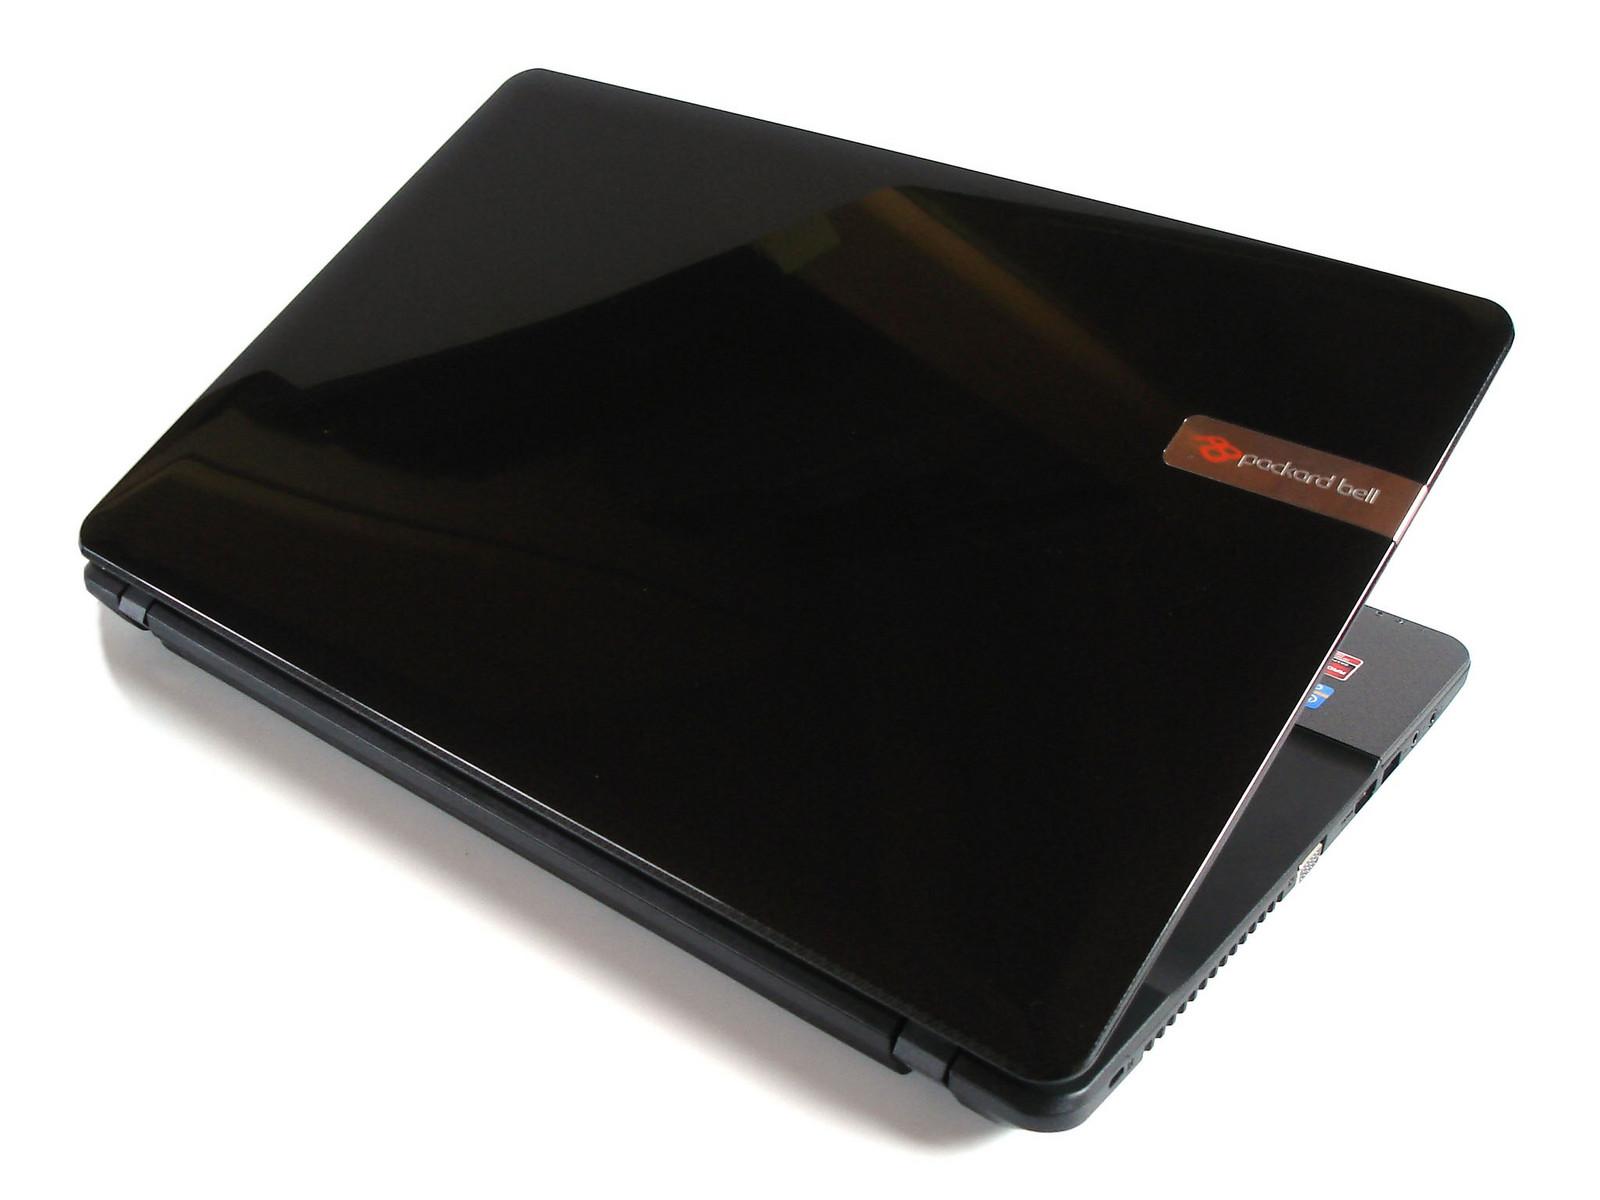 Packard Bell EasyNote LS44HR NEC USB 3.0 Windows